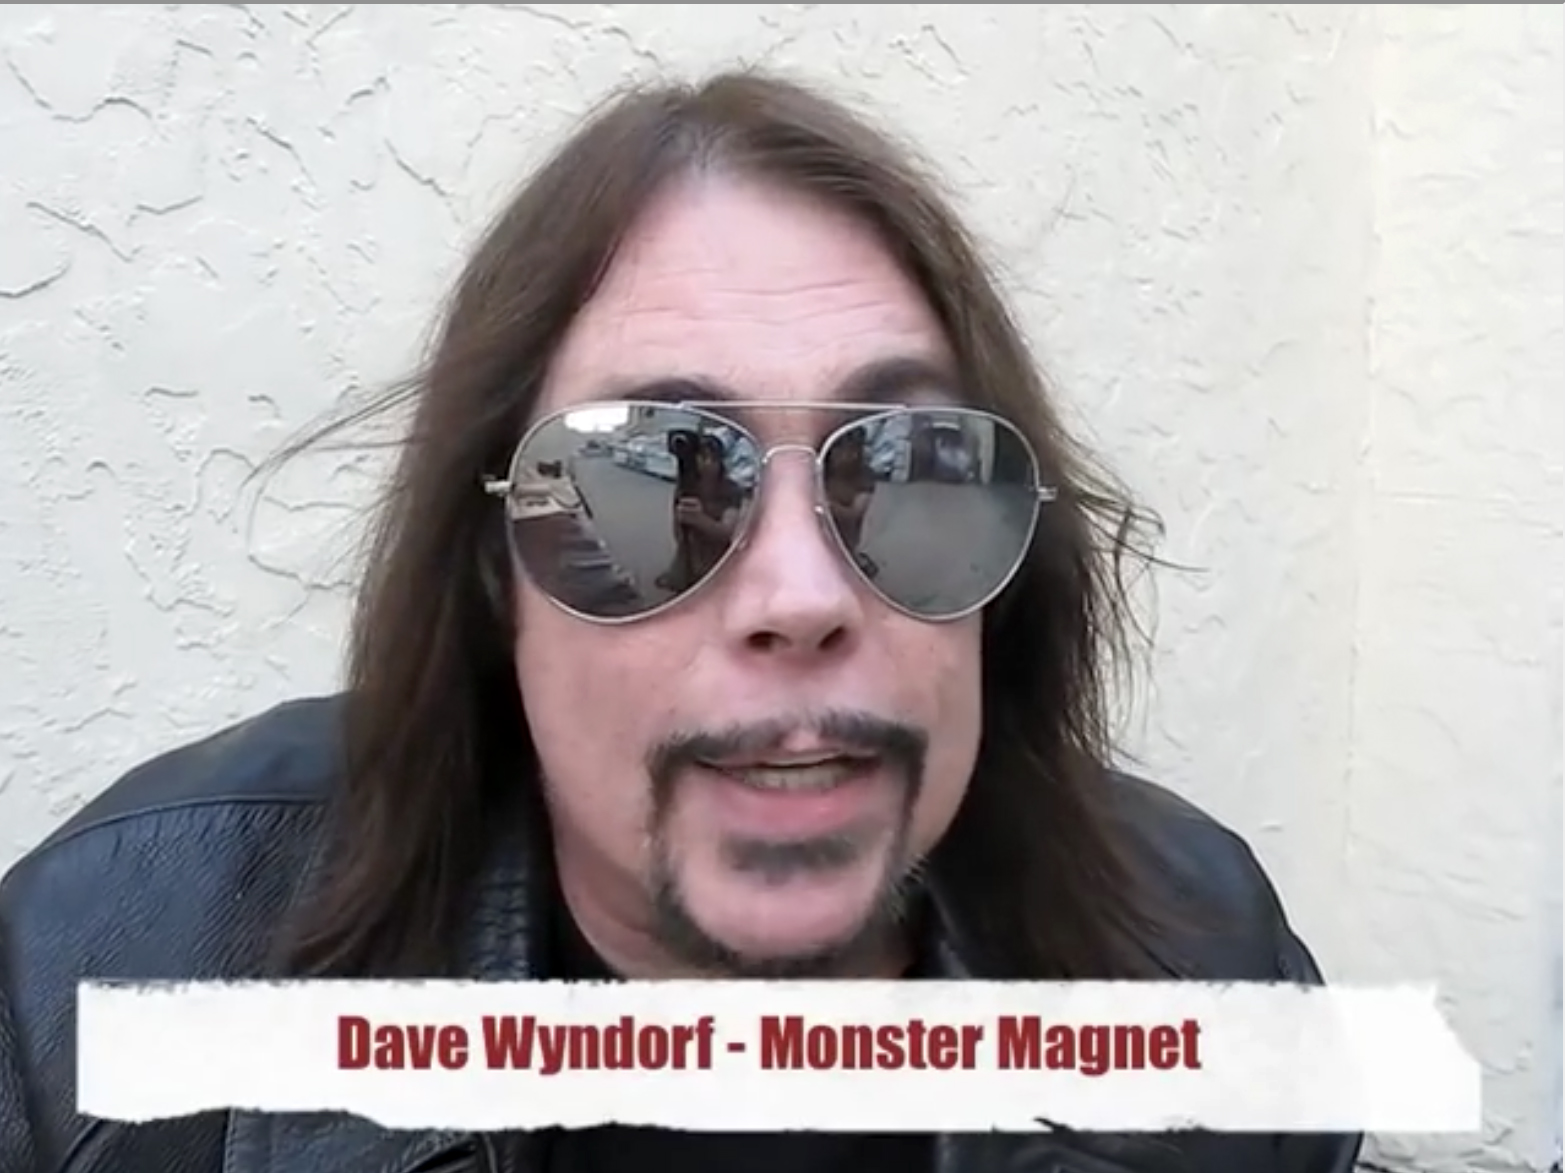 Dave Wyndorf – Monster Magnet